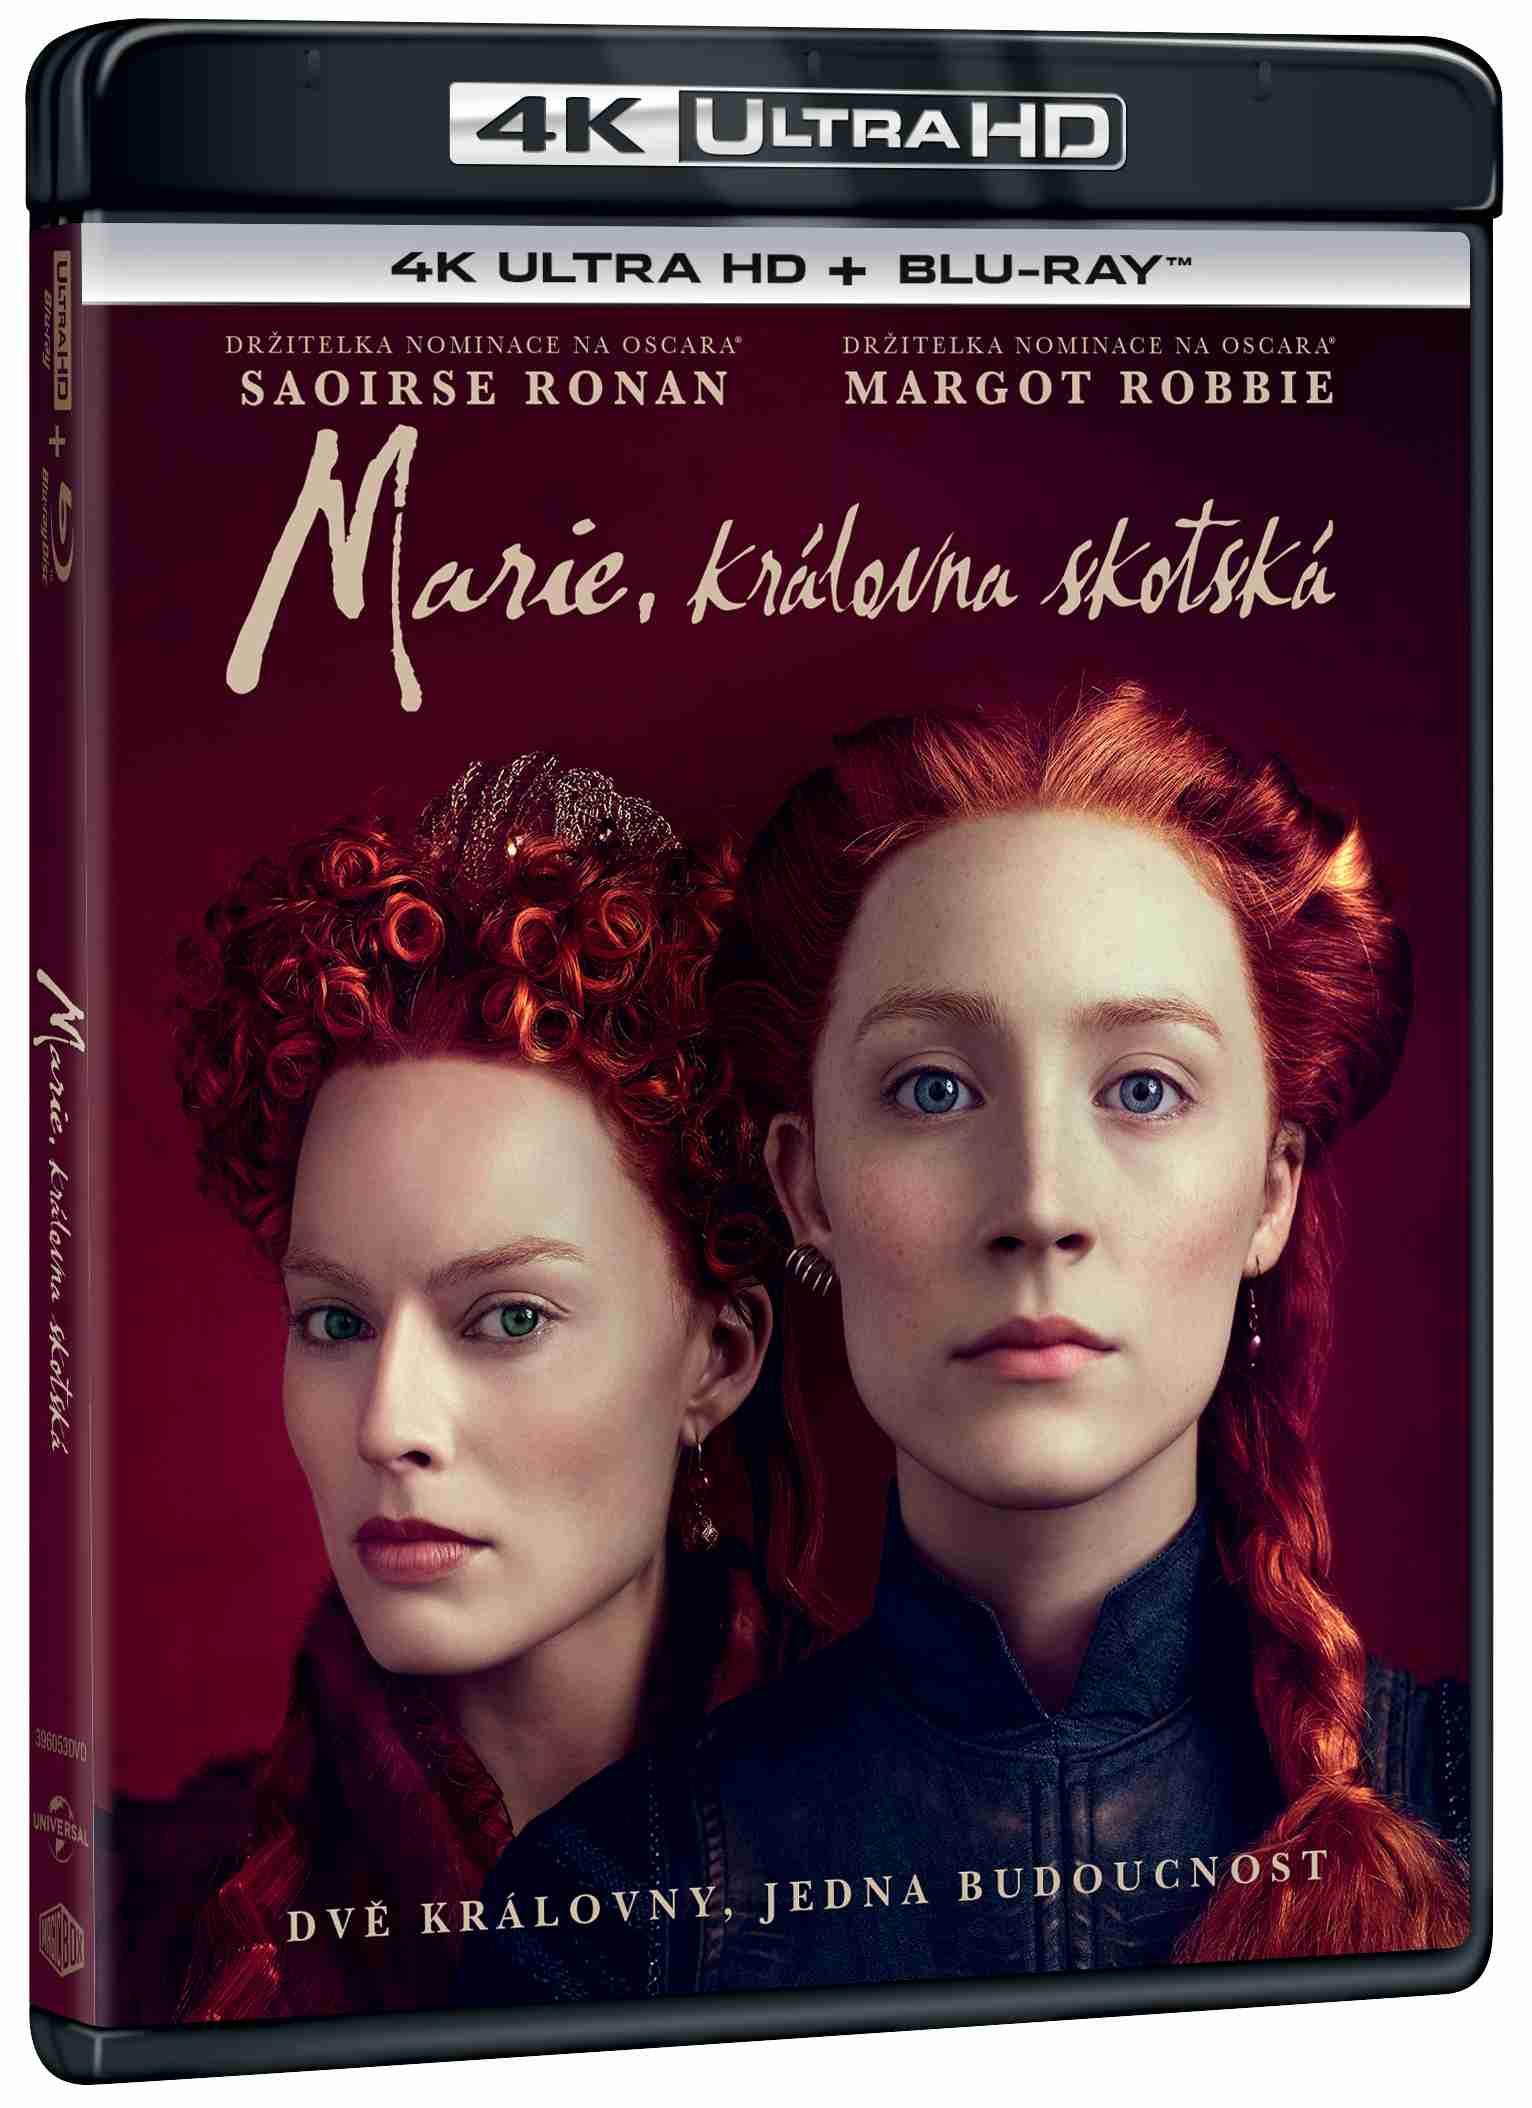 Marie, královna skotská (4K ULTRA HD) - UHD Blu-ray + Blu-ray (2 BD)